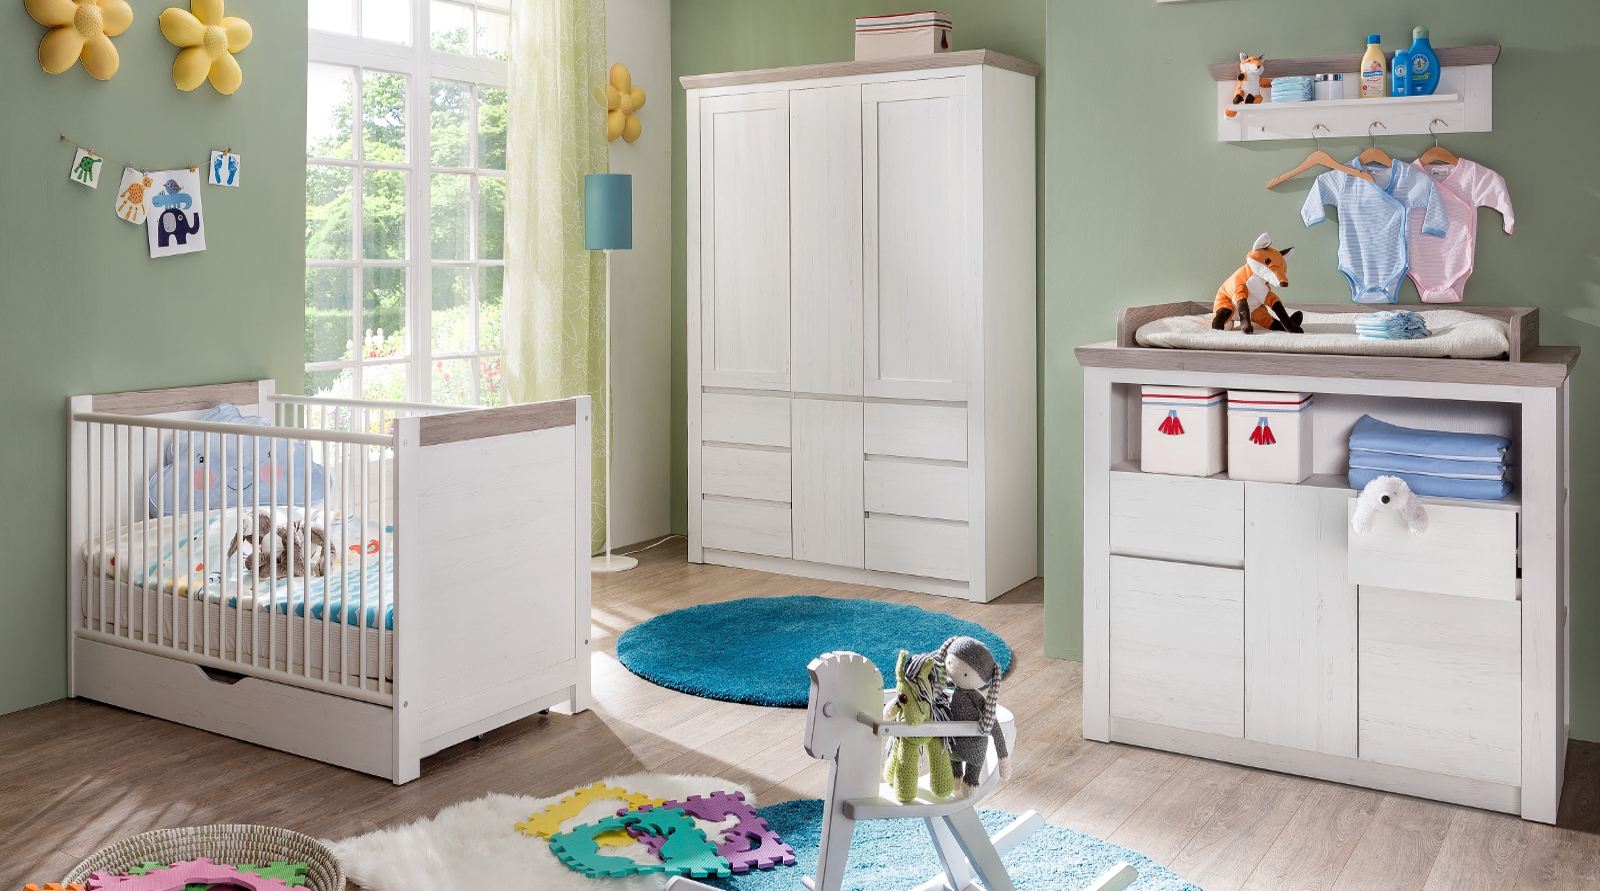 babybett 140x70 gitterbett weiss pinie kinderbett komplett mit lattenrost nils ebay. Black Bedroom Furniture Sets. Home Design Ideas